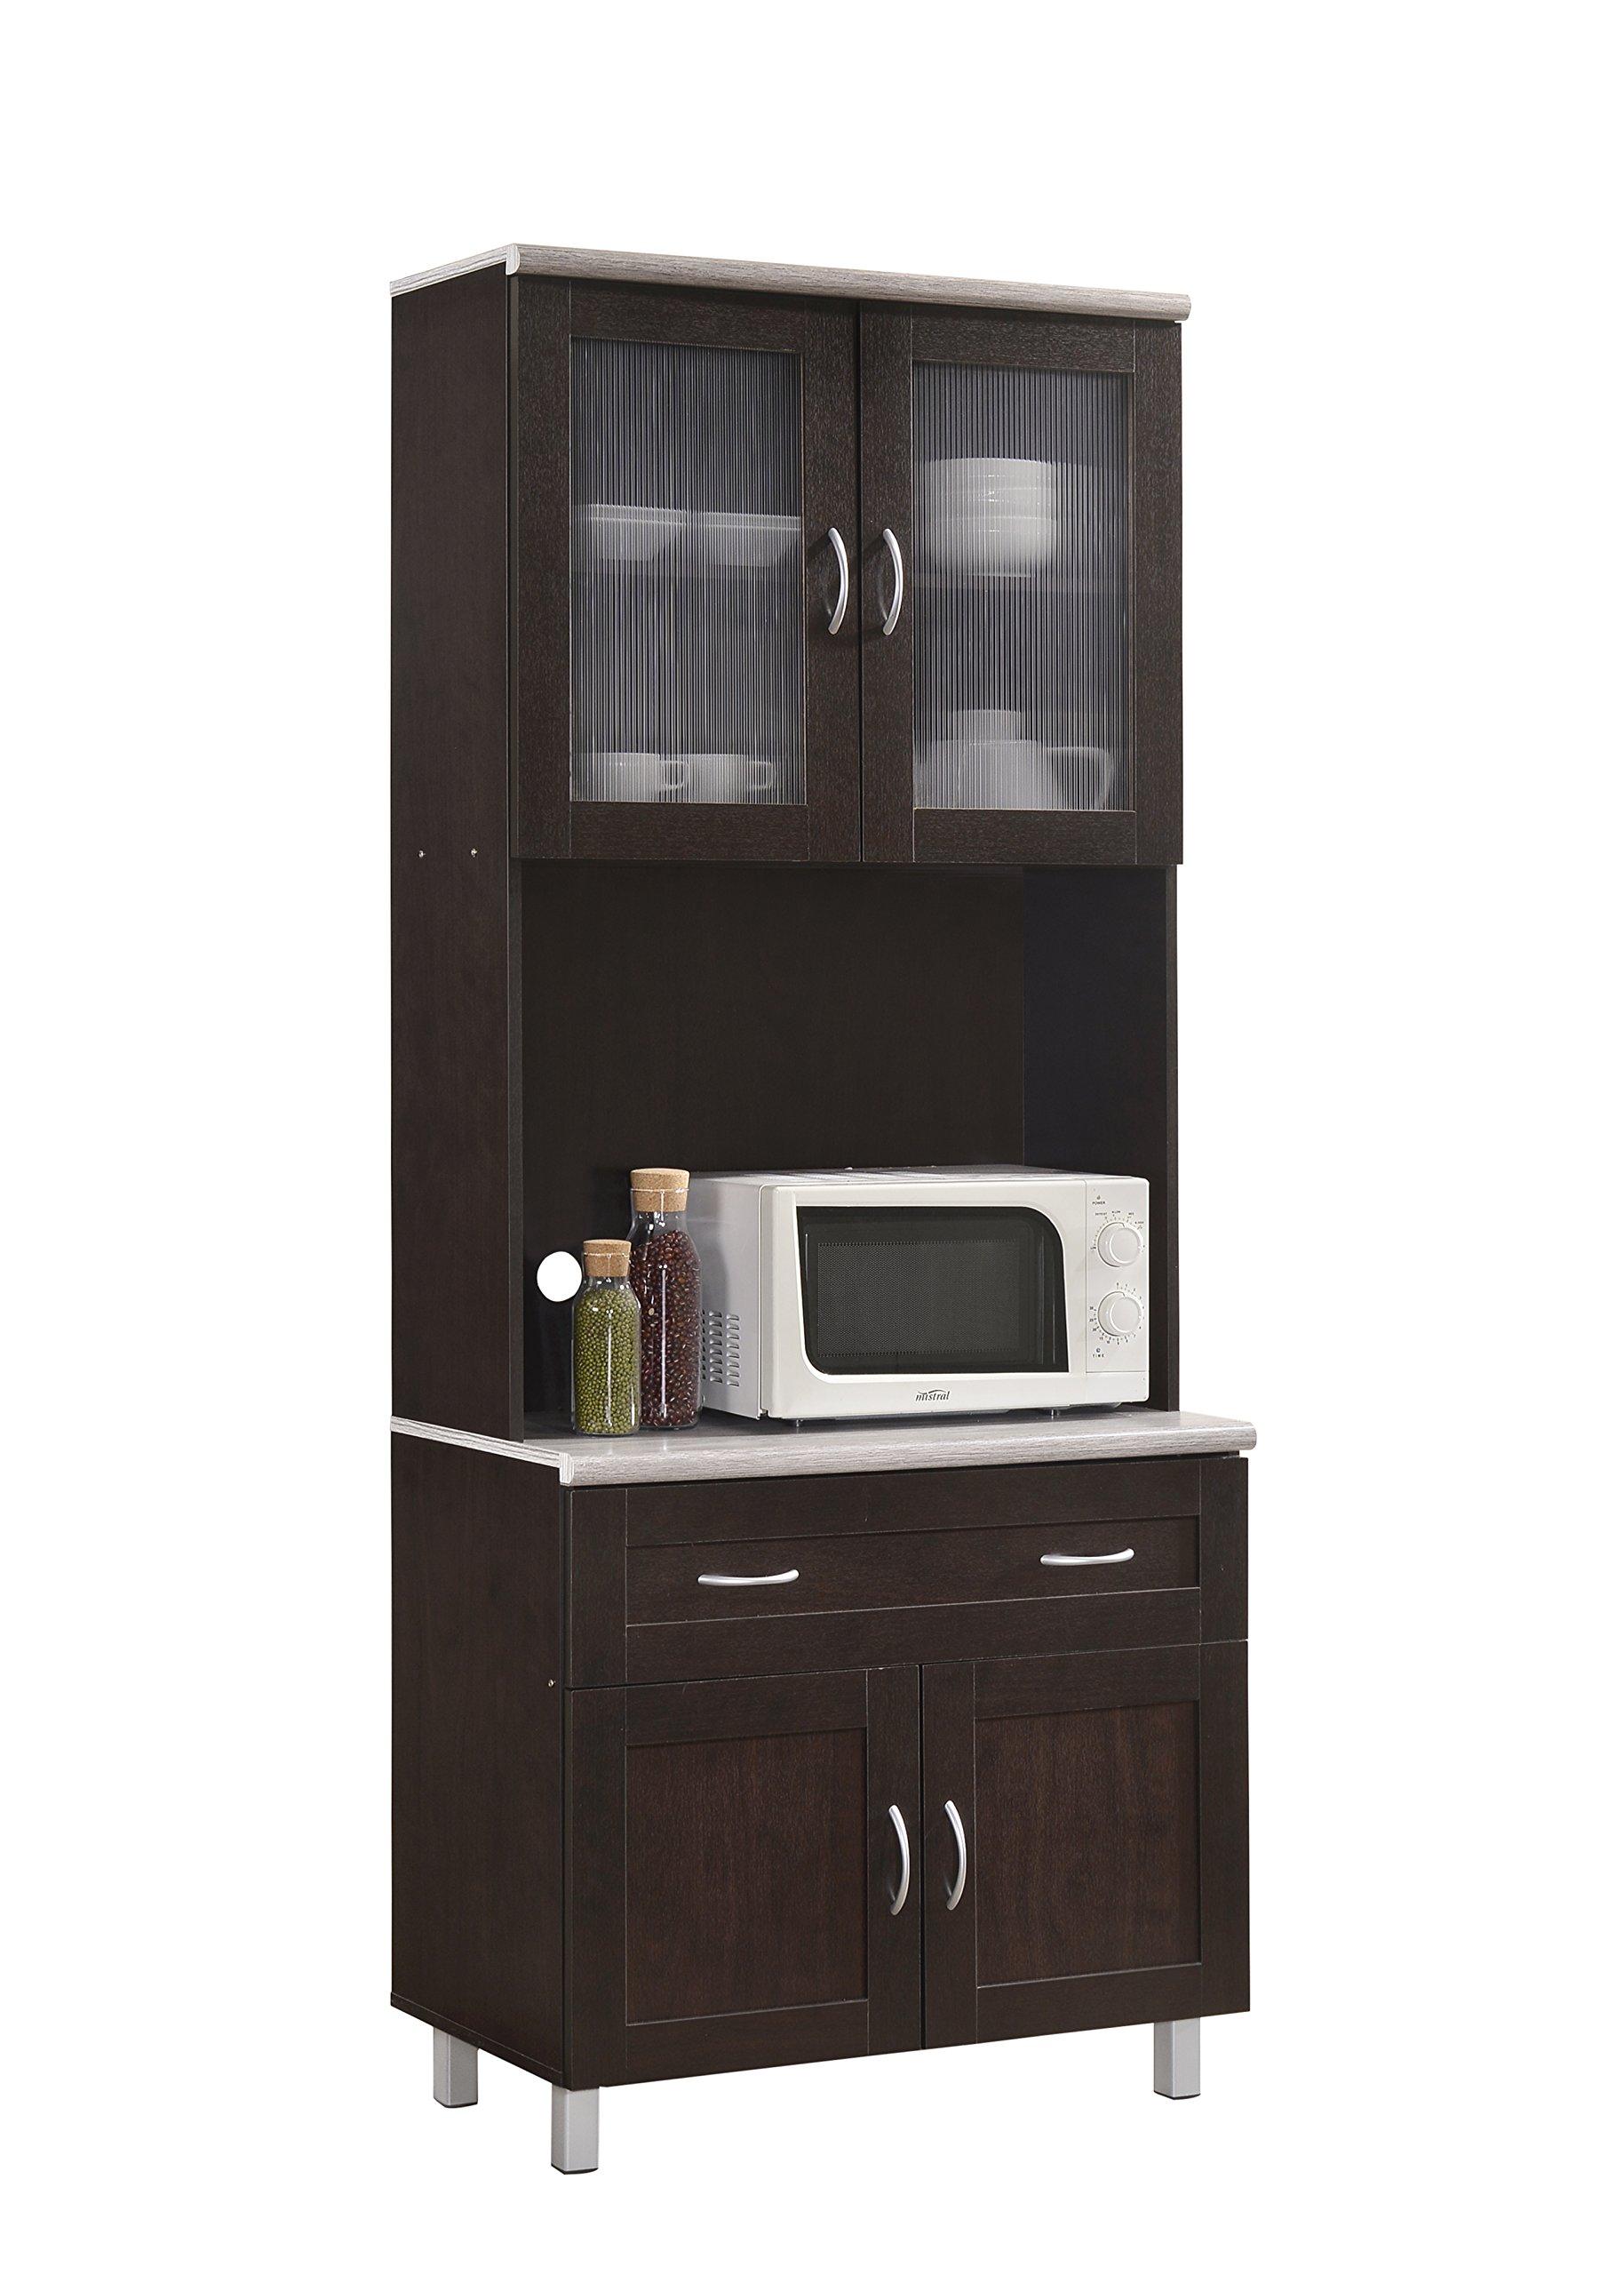 Hodedah HIK92 Choco-Grey Kitchen Cabinet, Chocolate